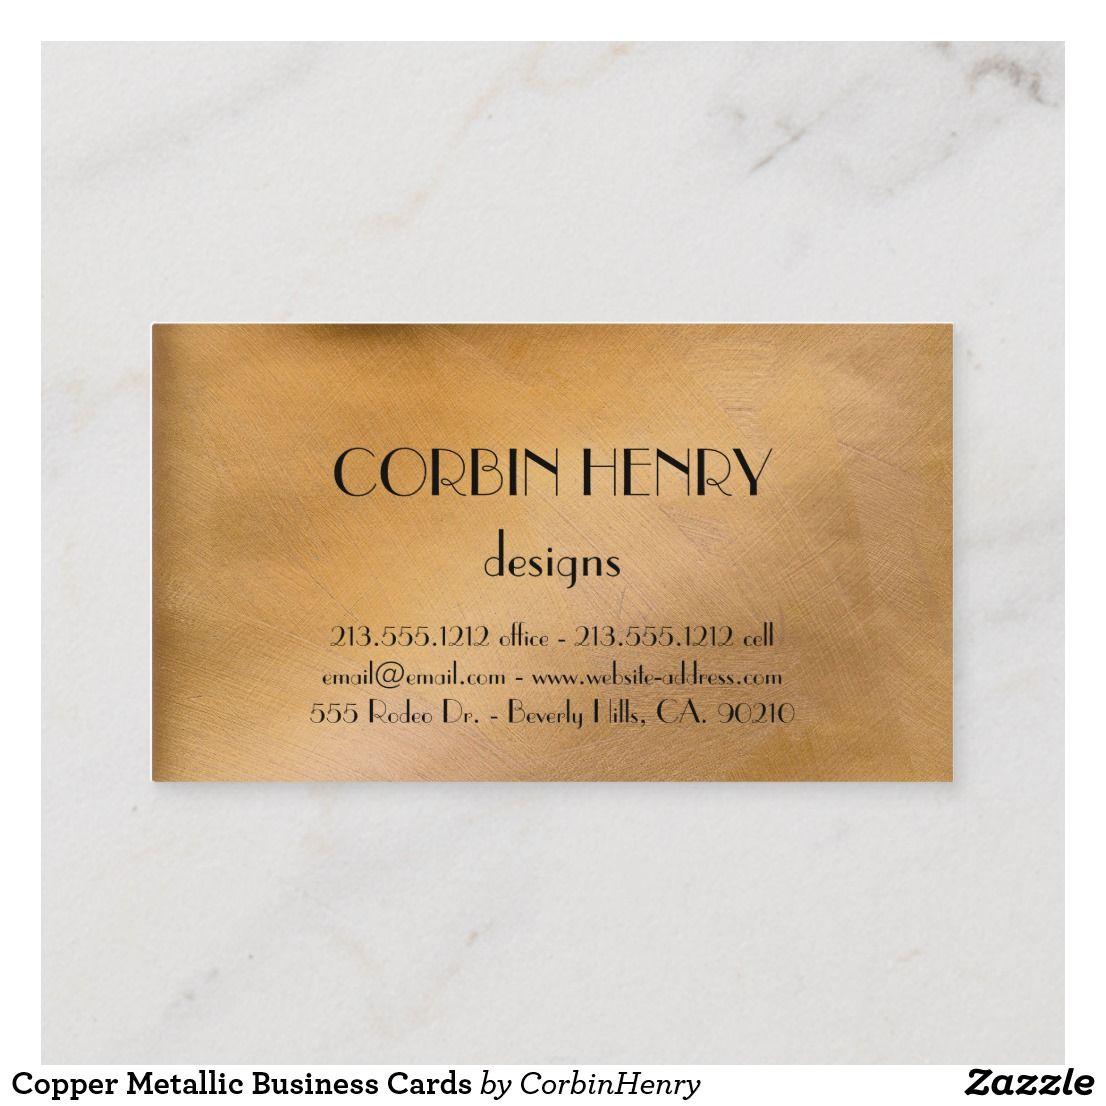 Copper Metallic Business Cards Zazzle Com Business Pens Classy Business Cards Business Cards